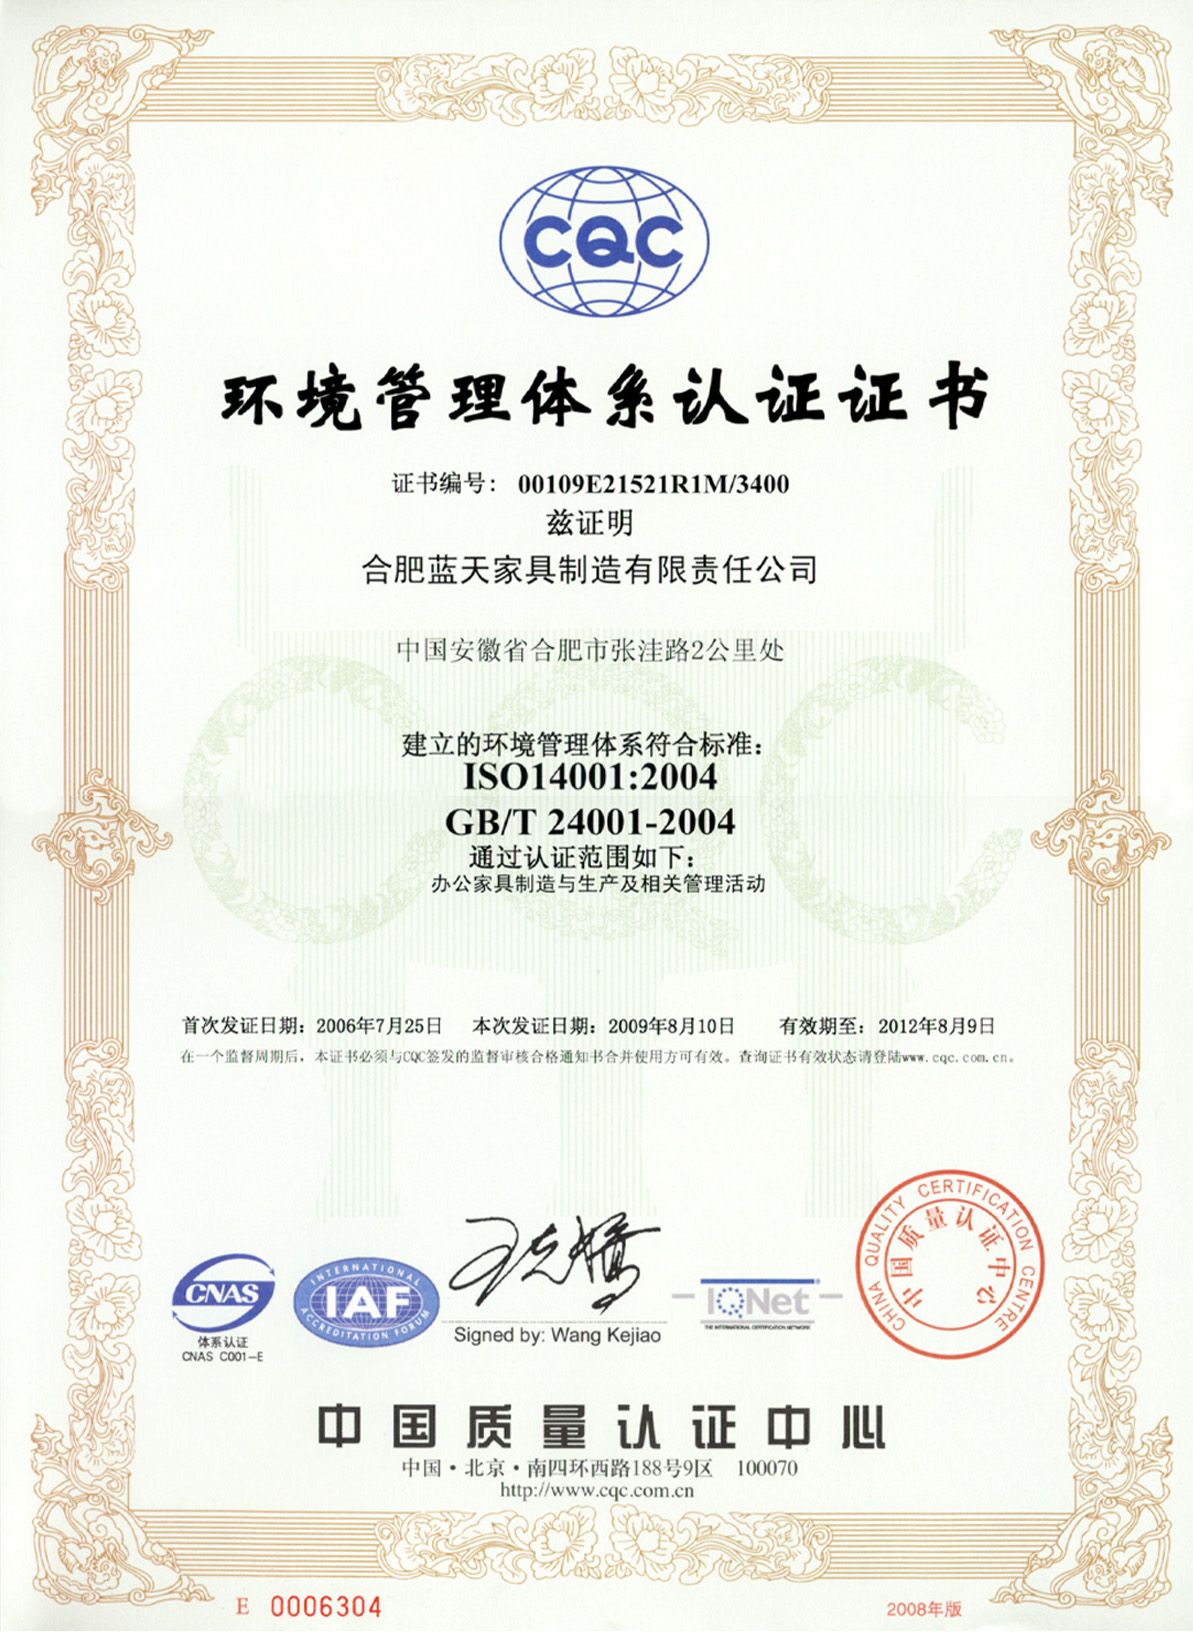 400-189-1955 add:中国·合肥市瑶海区新站工业园d区 e-mail:hfltjj